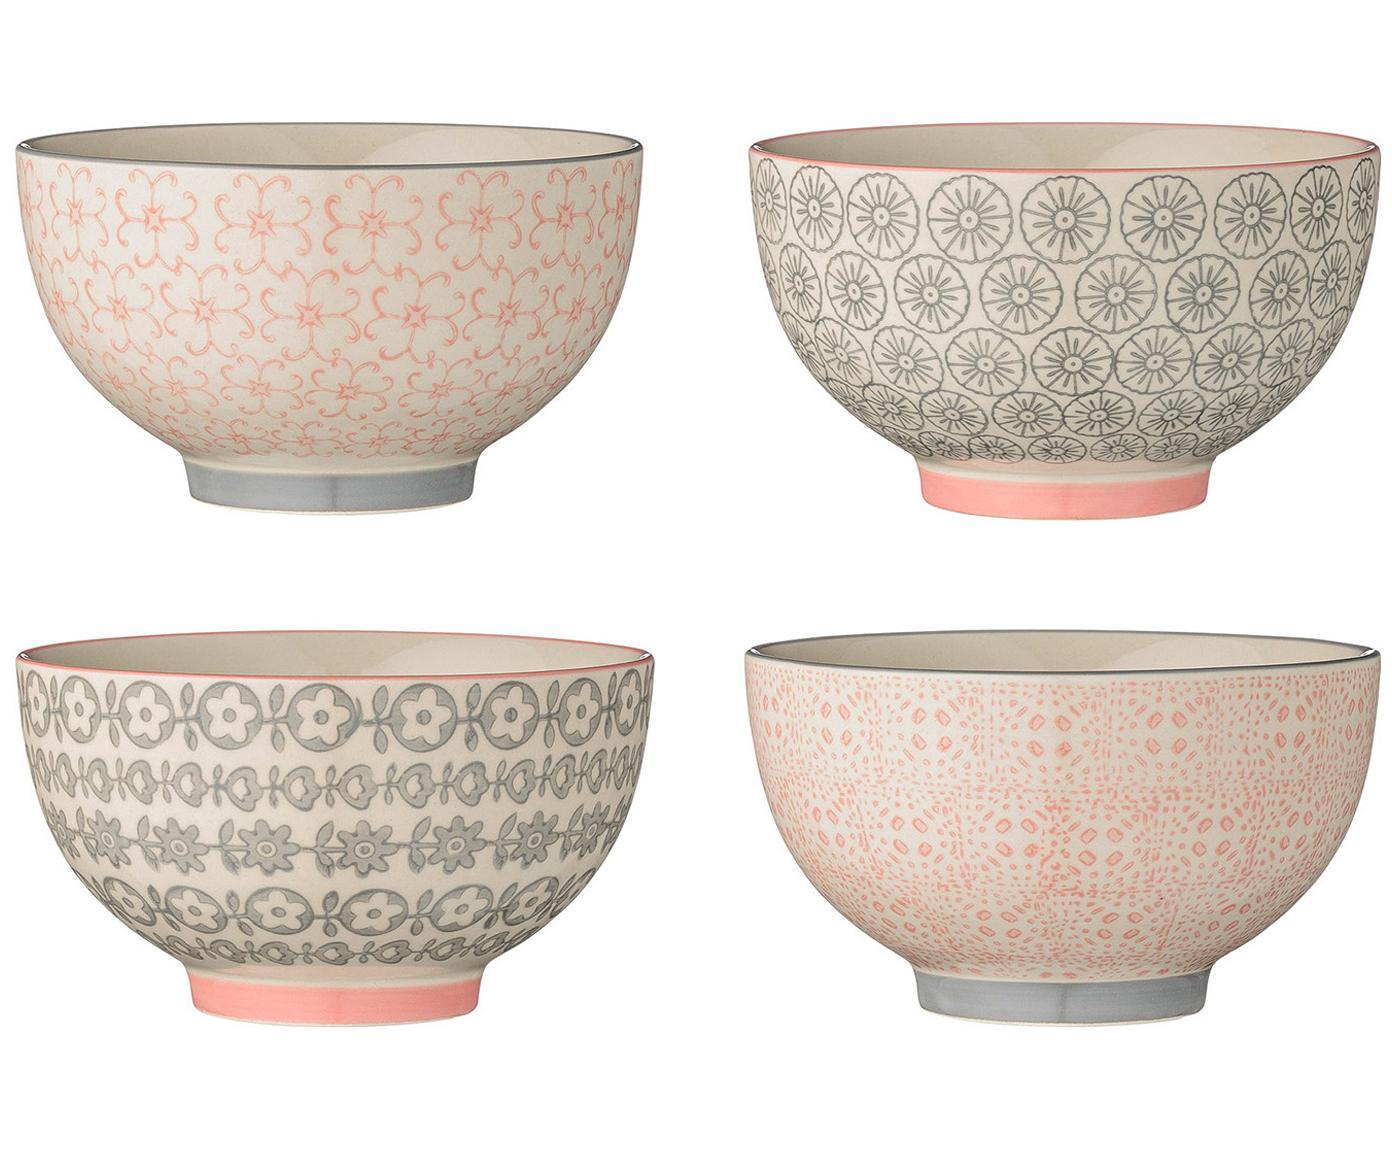 Set ciotole Cécile, 4 pz., Ceramica, Rosa, grigio, beige, Ø 13 x Alt. 8 cm